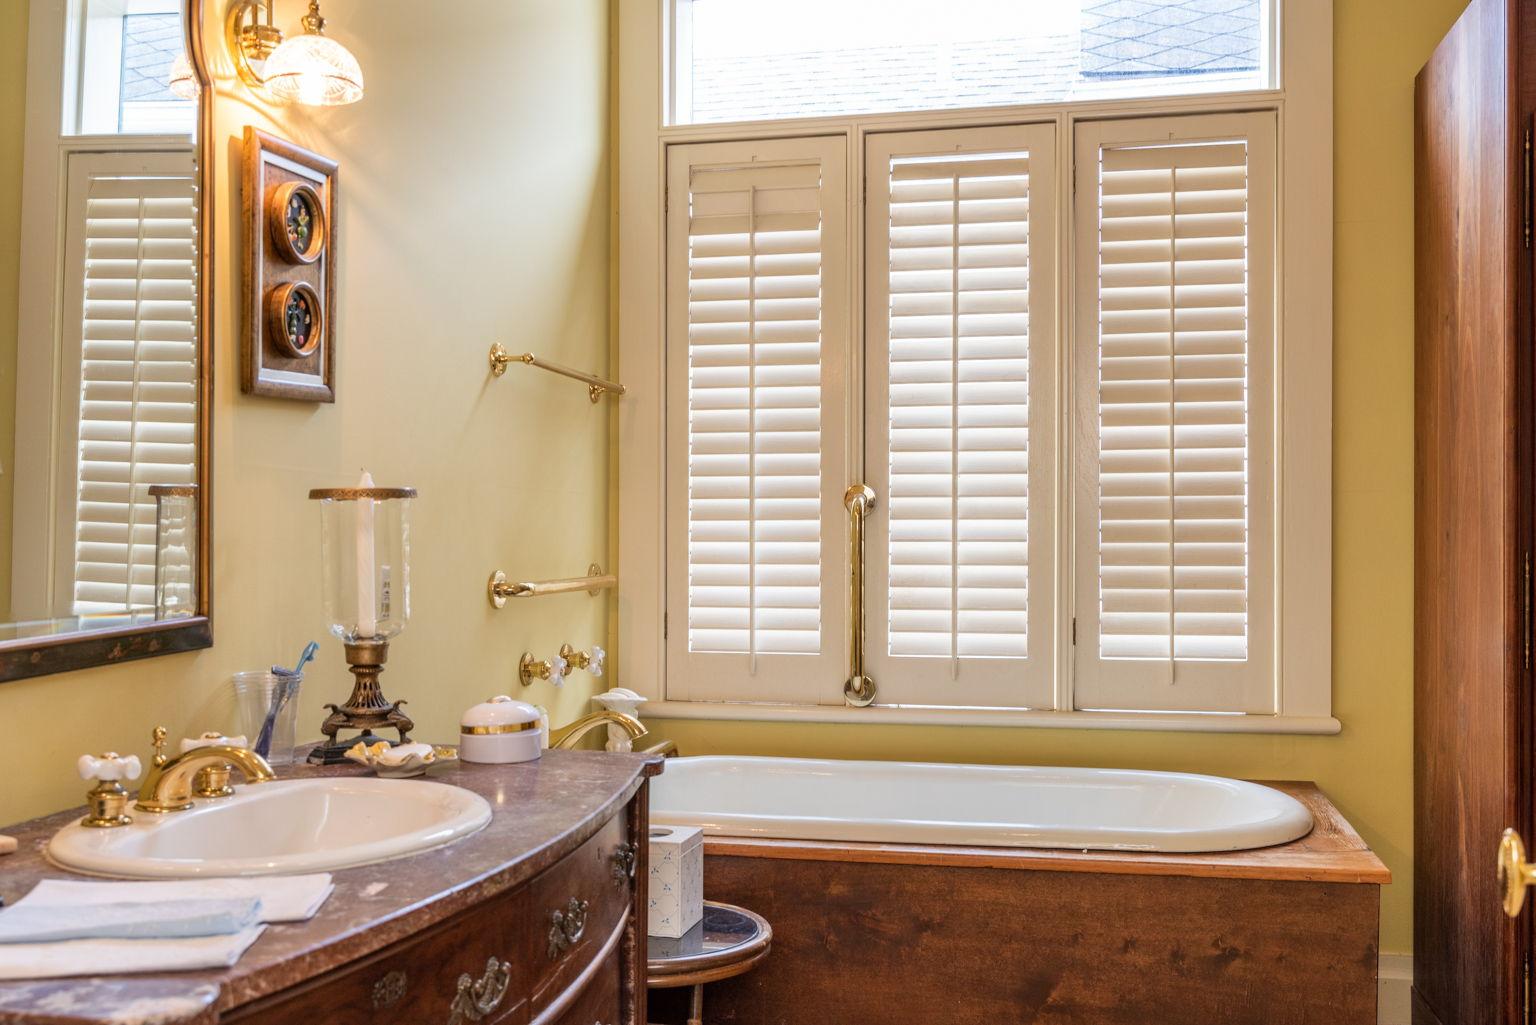 And a charming private bath with unique bathtub